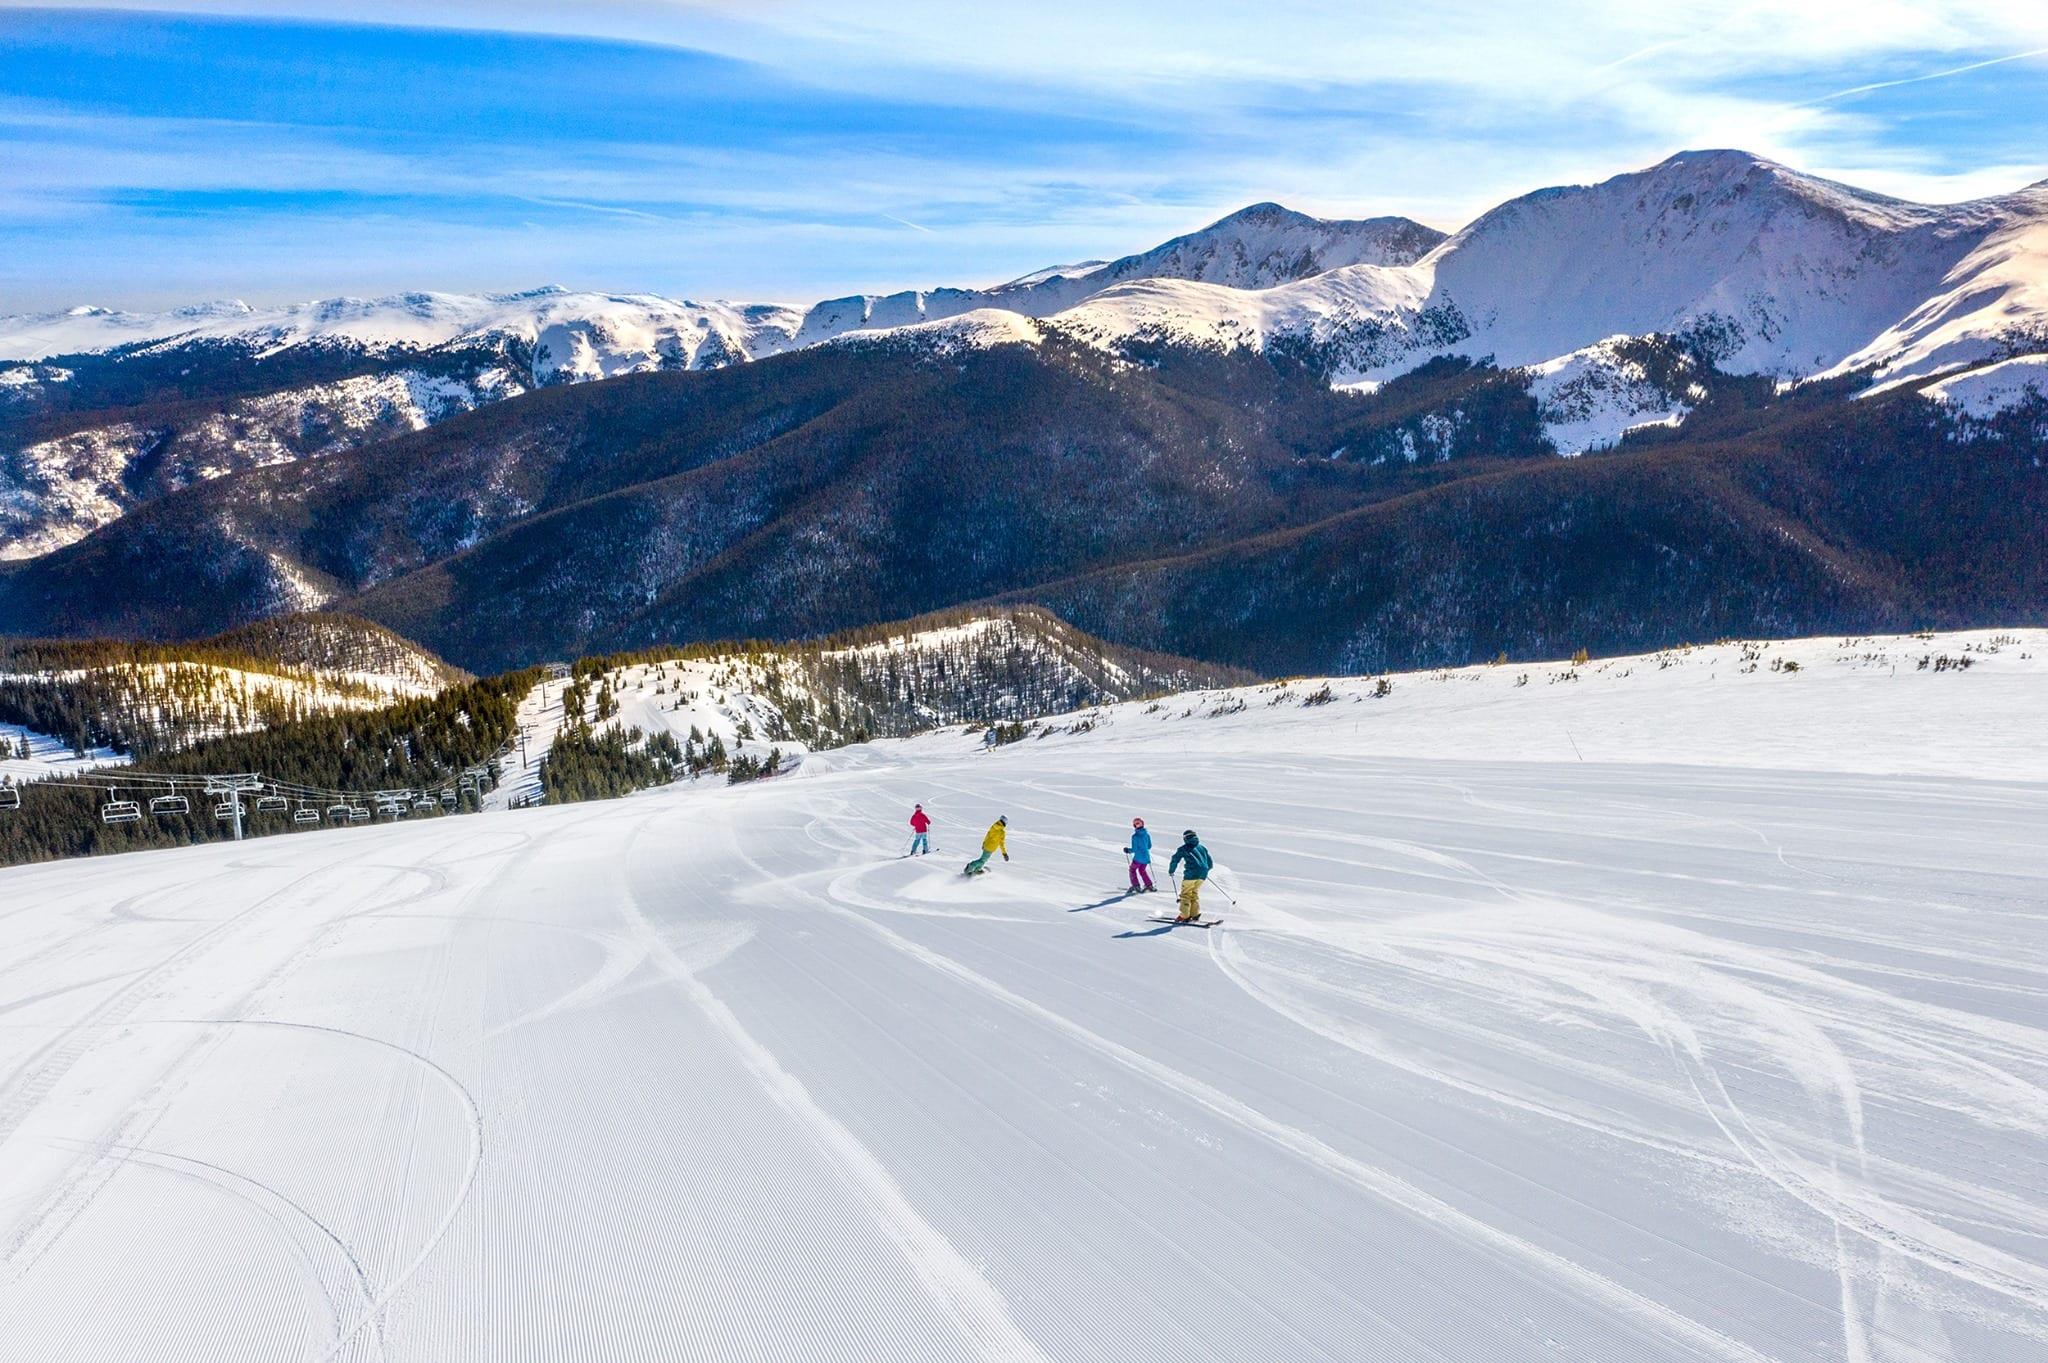 image of winter park ski resort